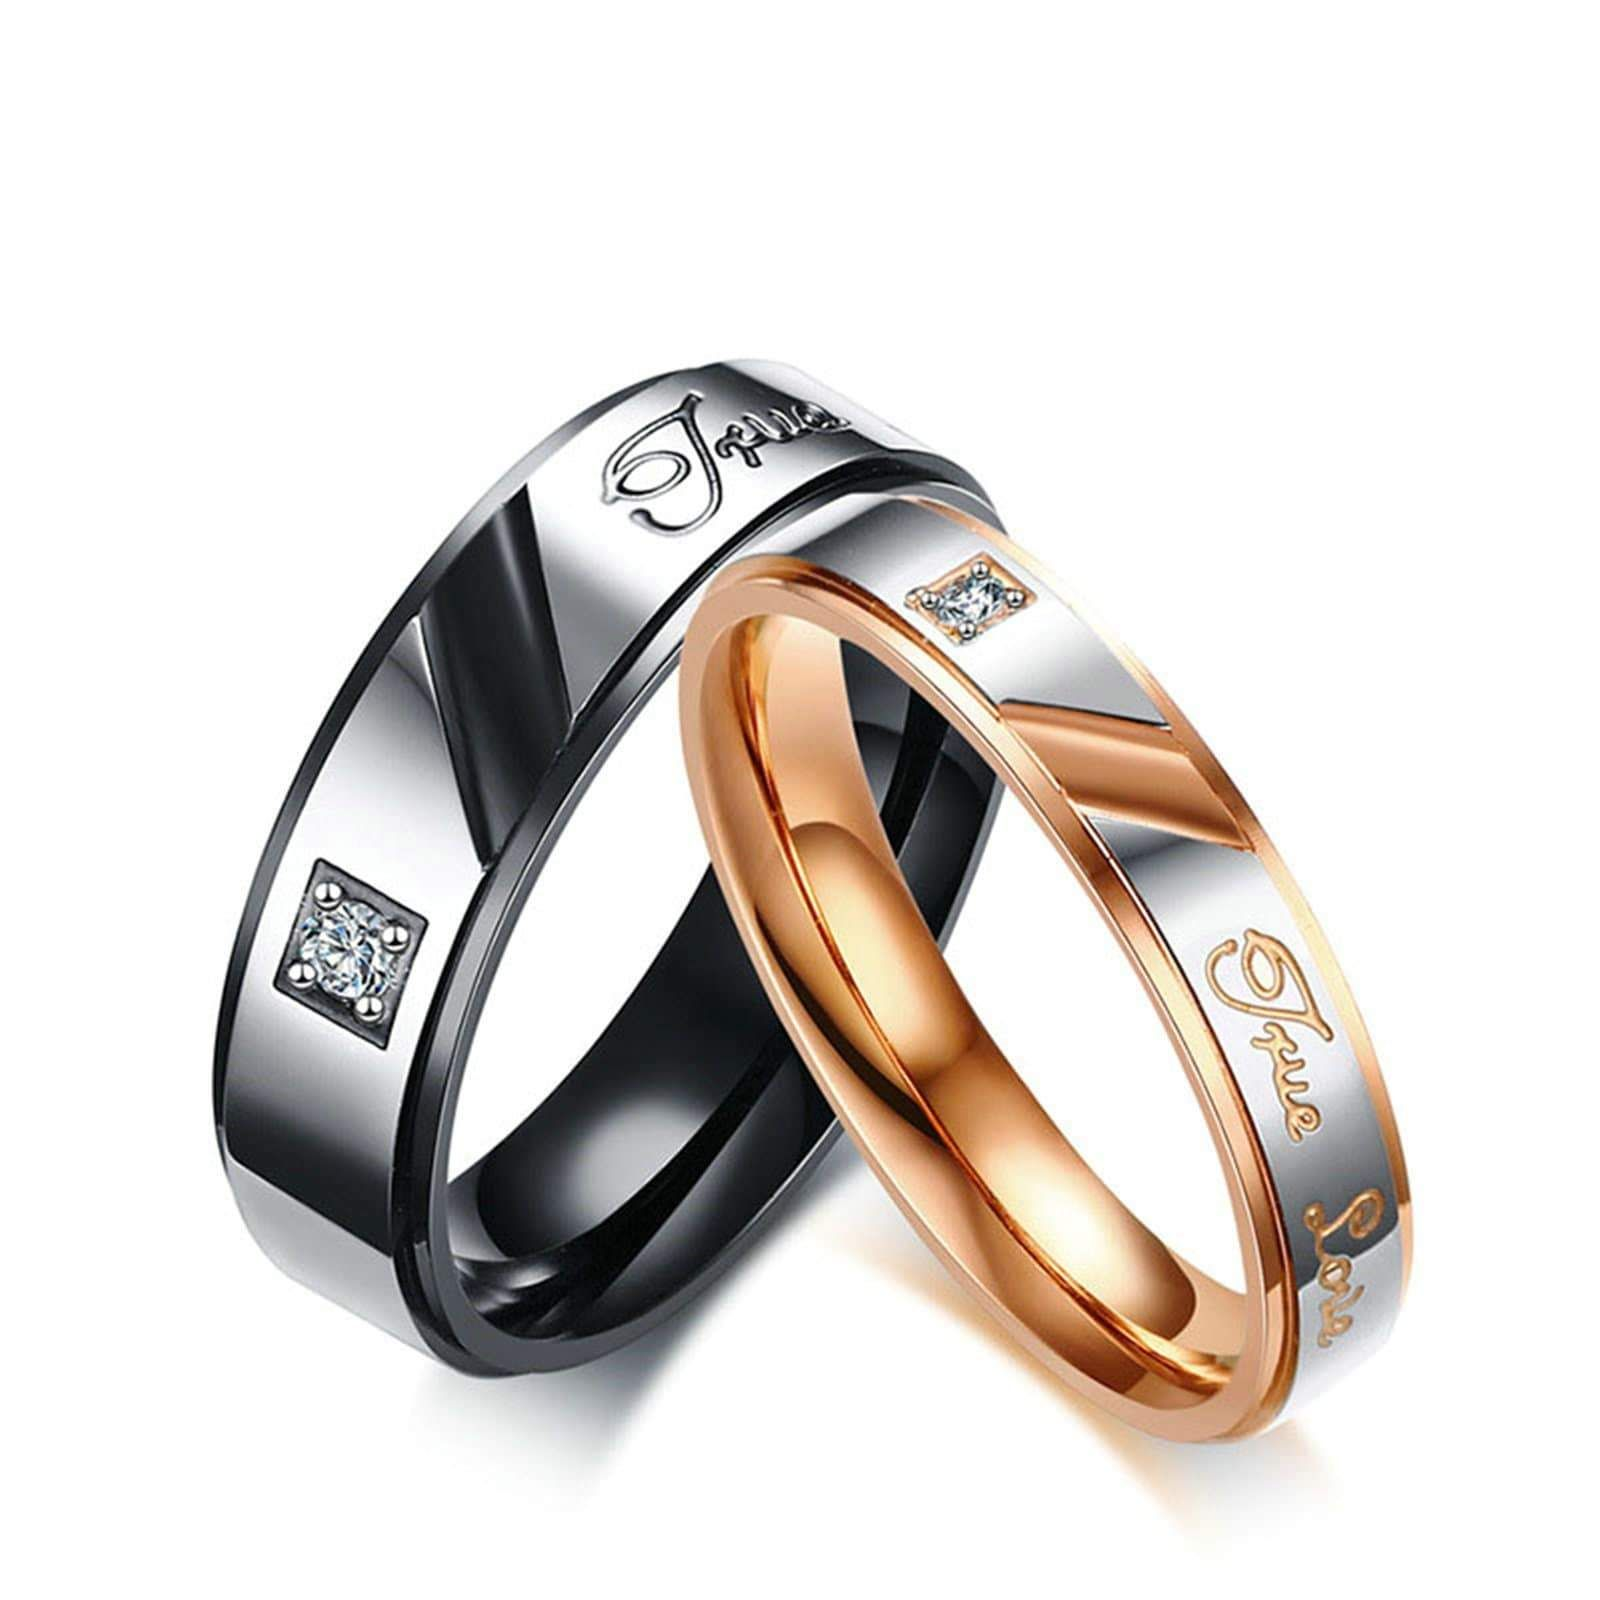 sz6-12 Couple Rings Titanium Black CZ Mens Ring Band Women/'s Wedding Ring Sets